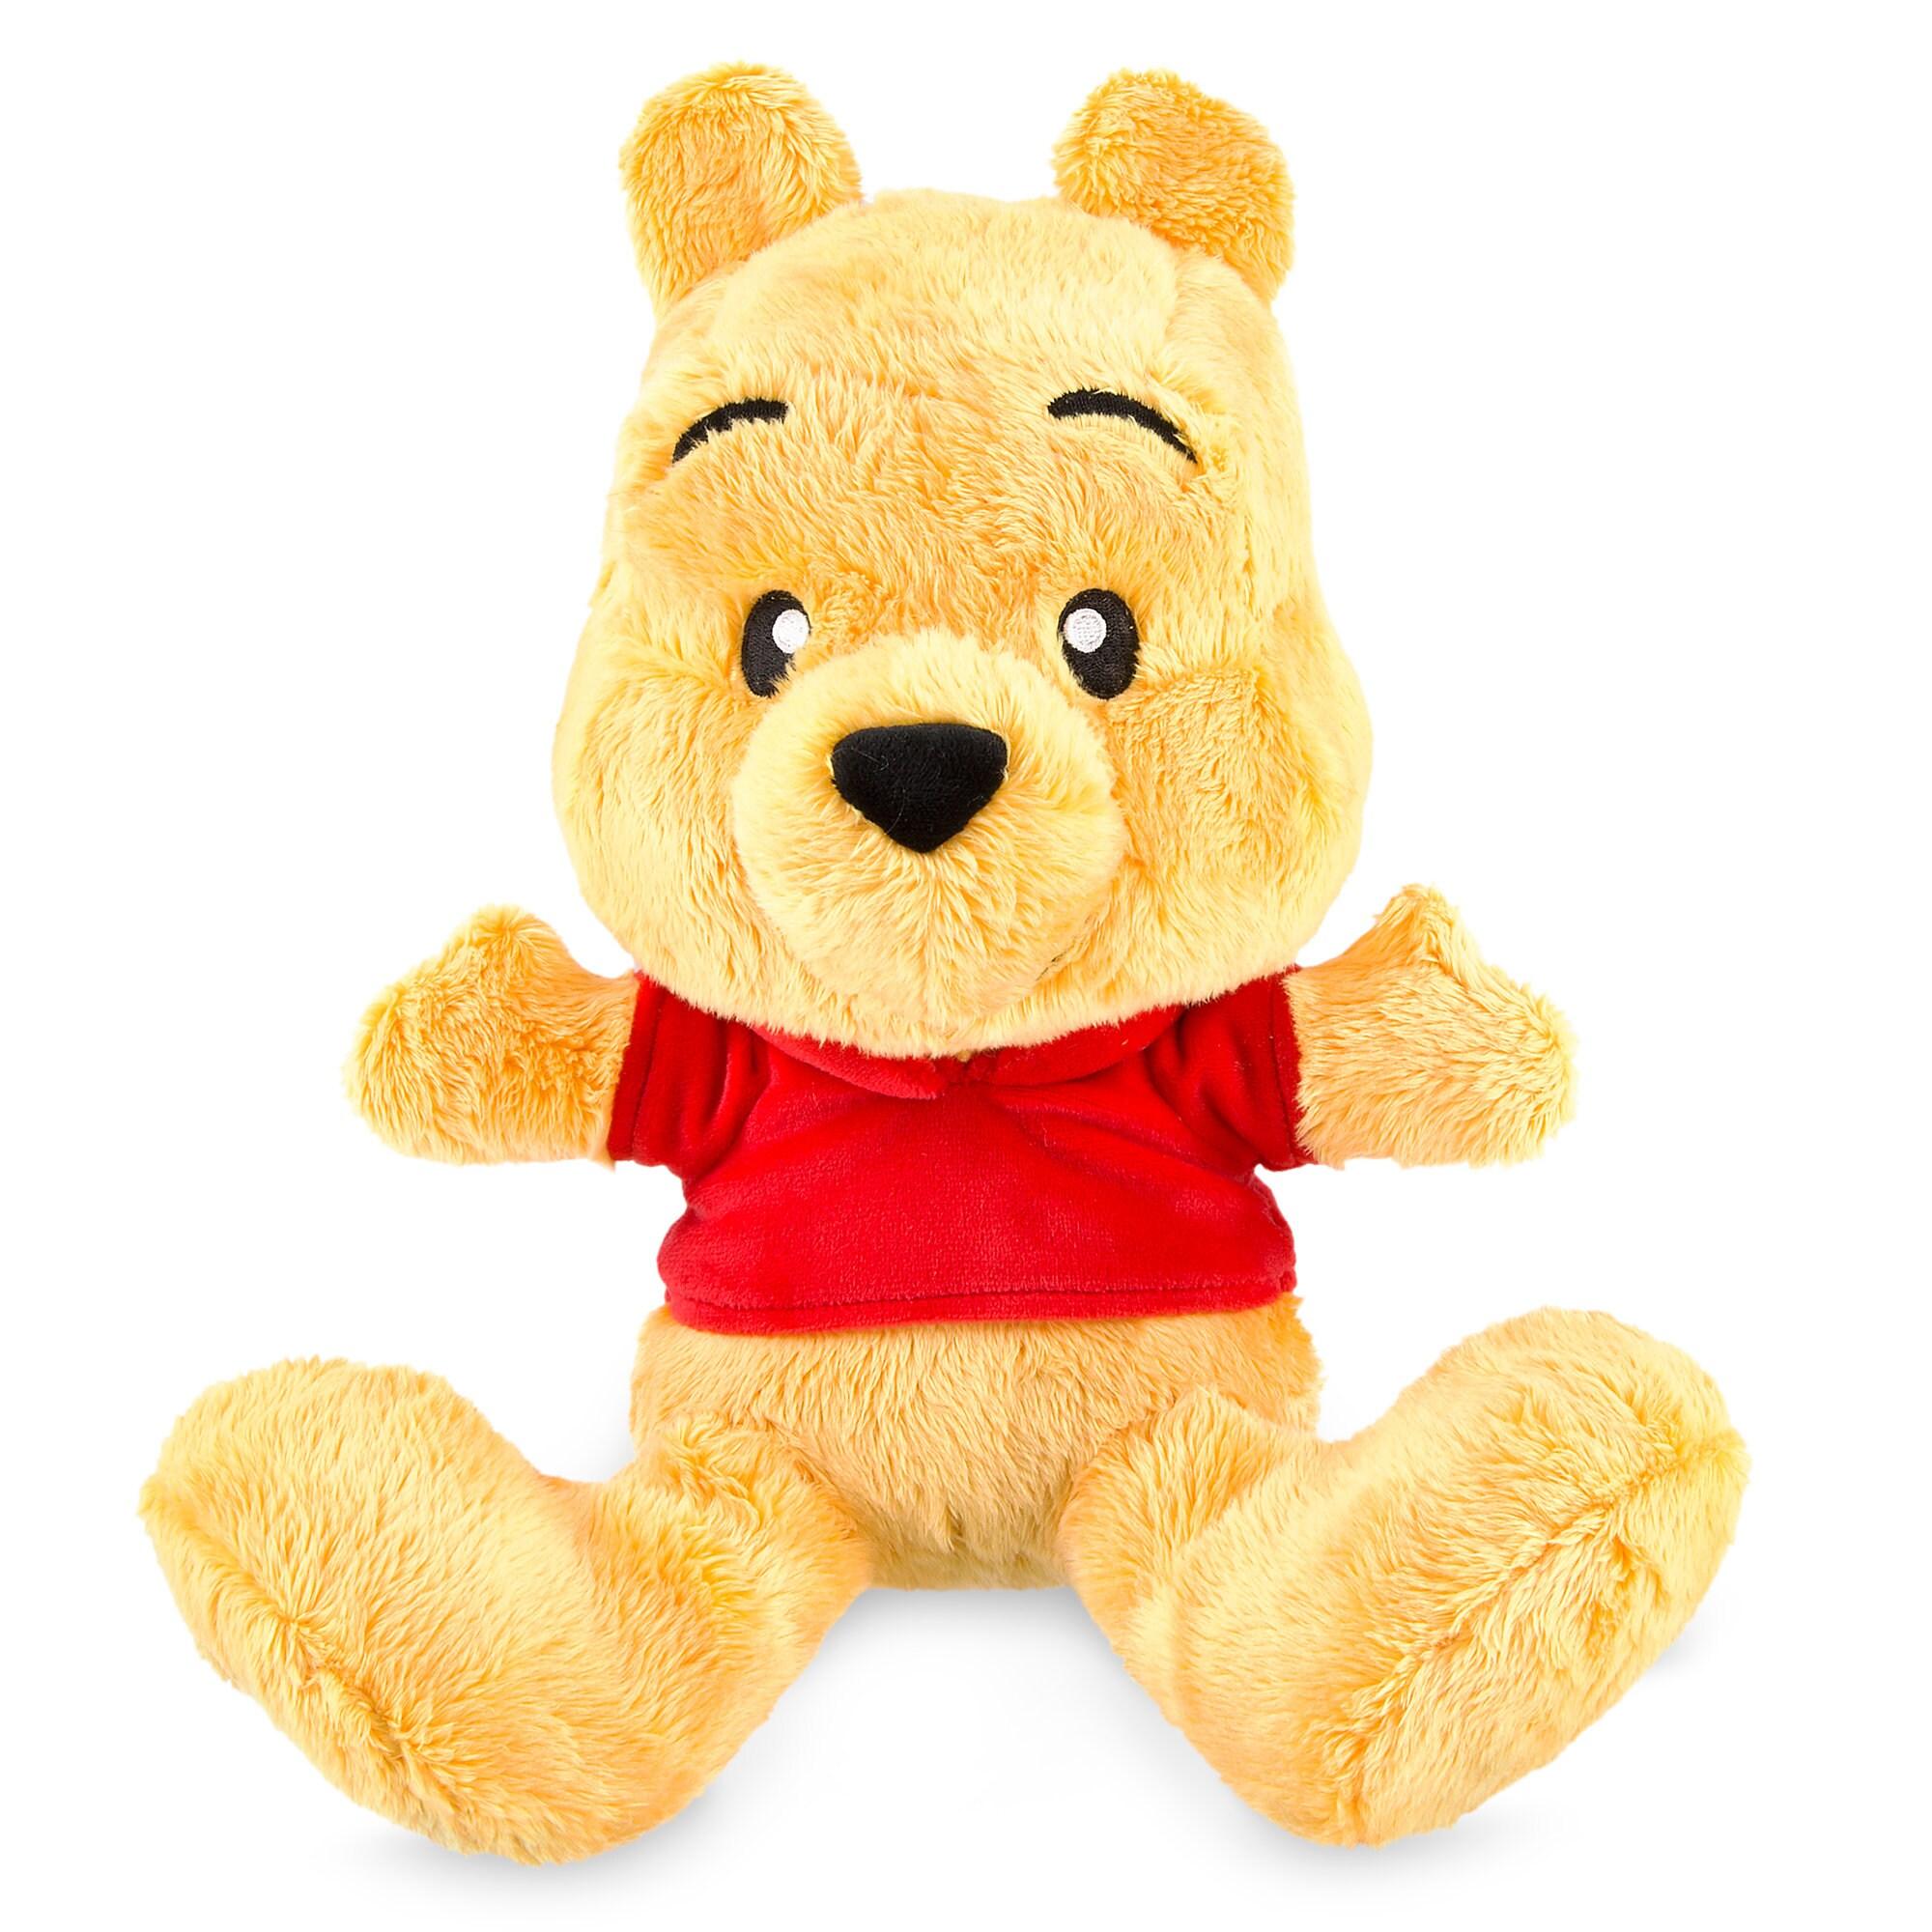 Winnie the Pooh Big Feet Plush - Small - 10''